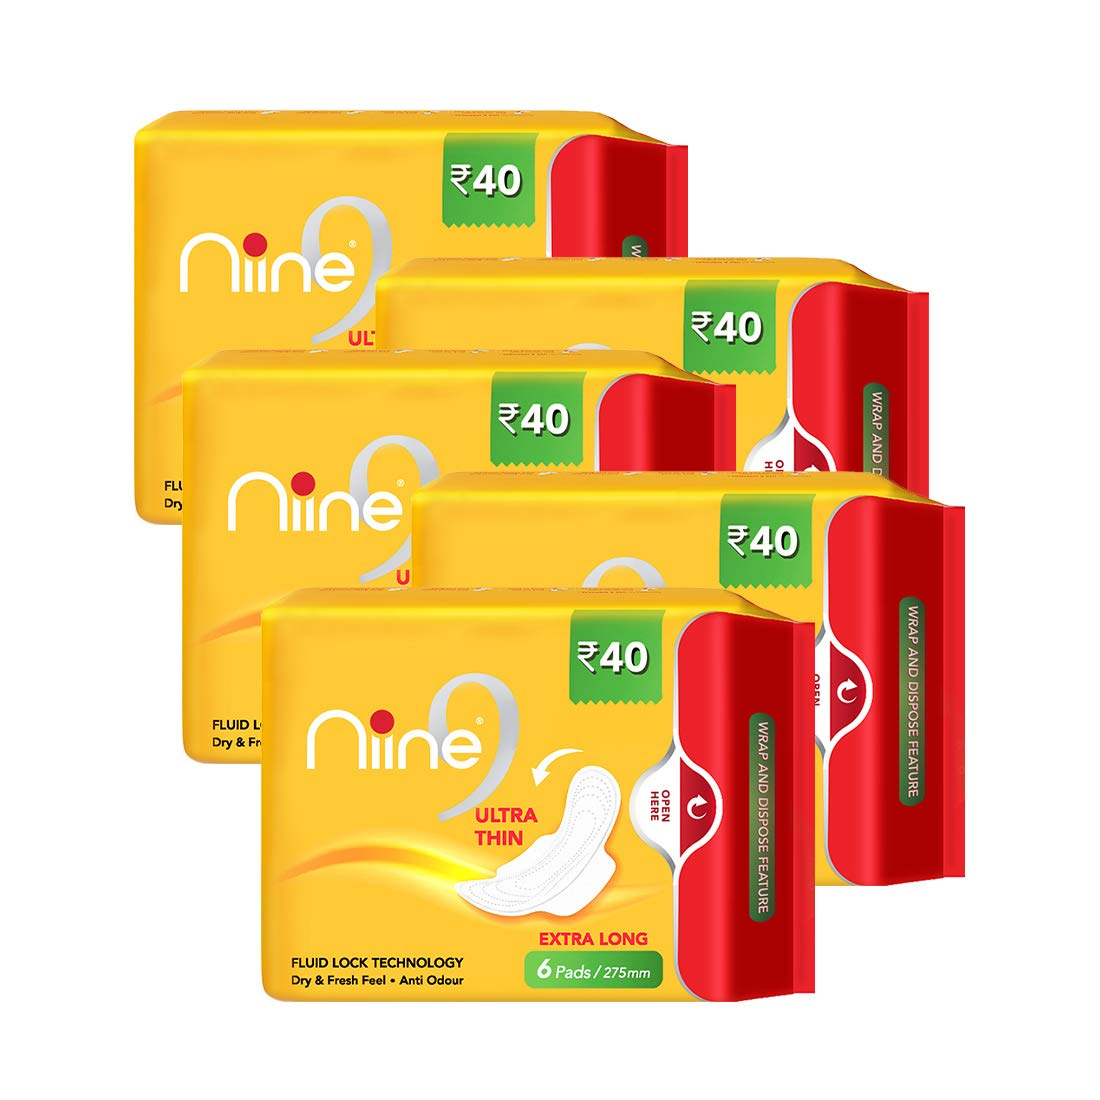 NIINE   Niine Ultra Thin Sanitary Pads for Women (Pack of 5)